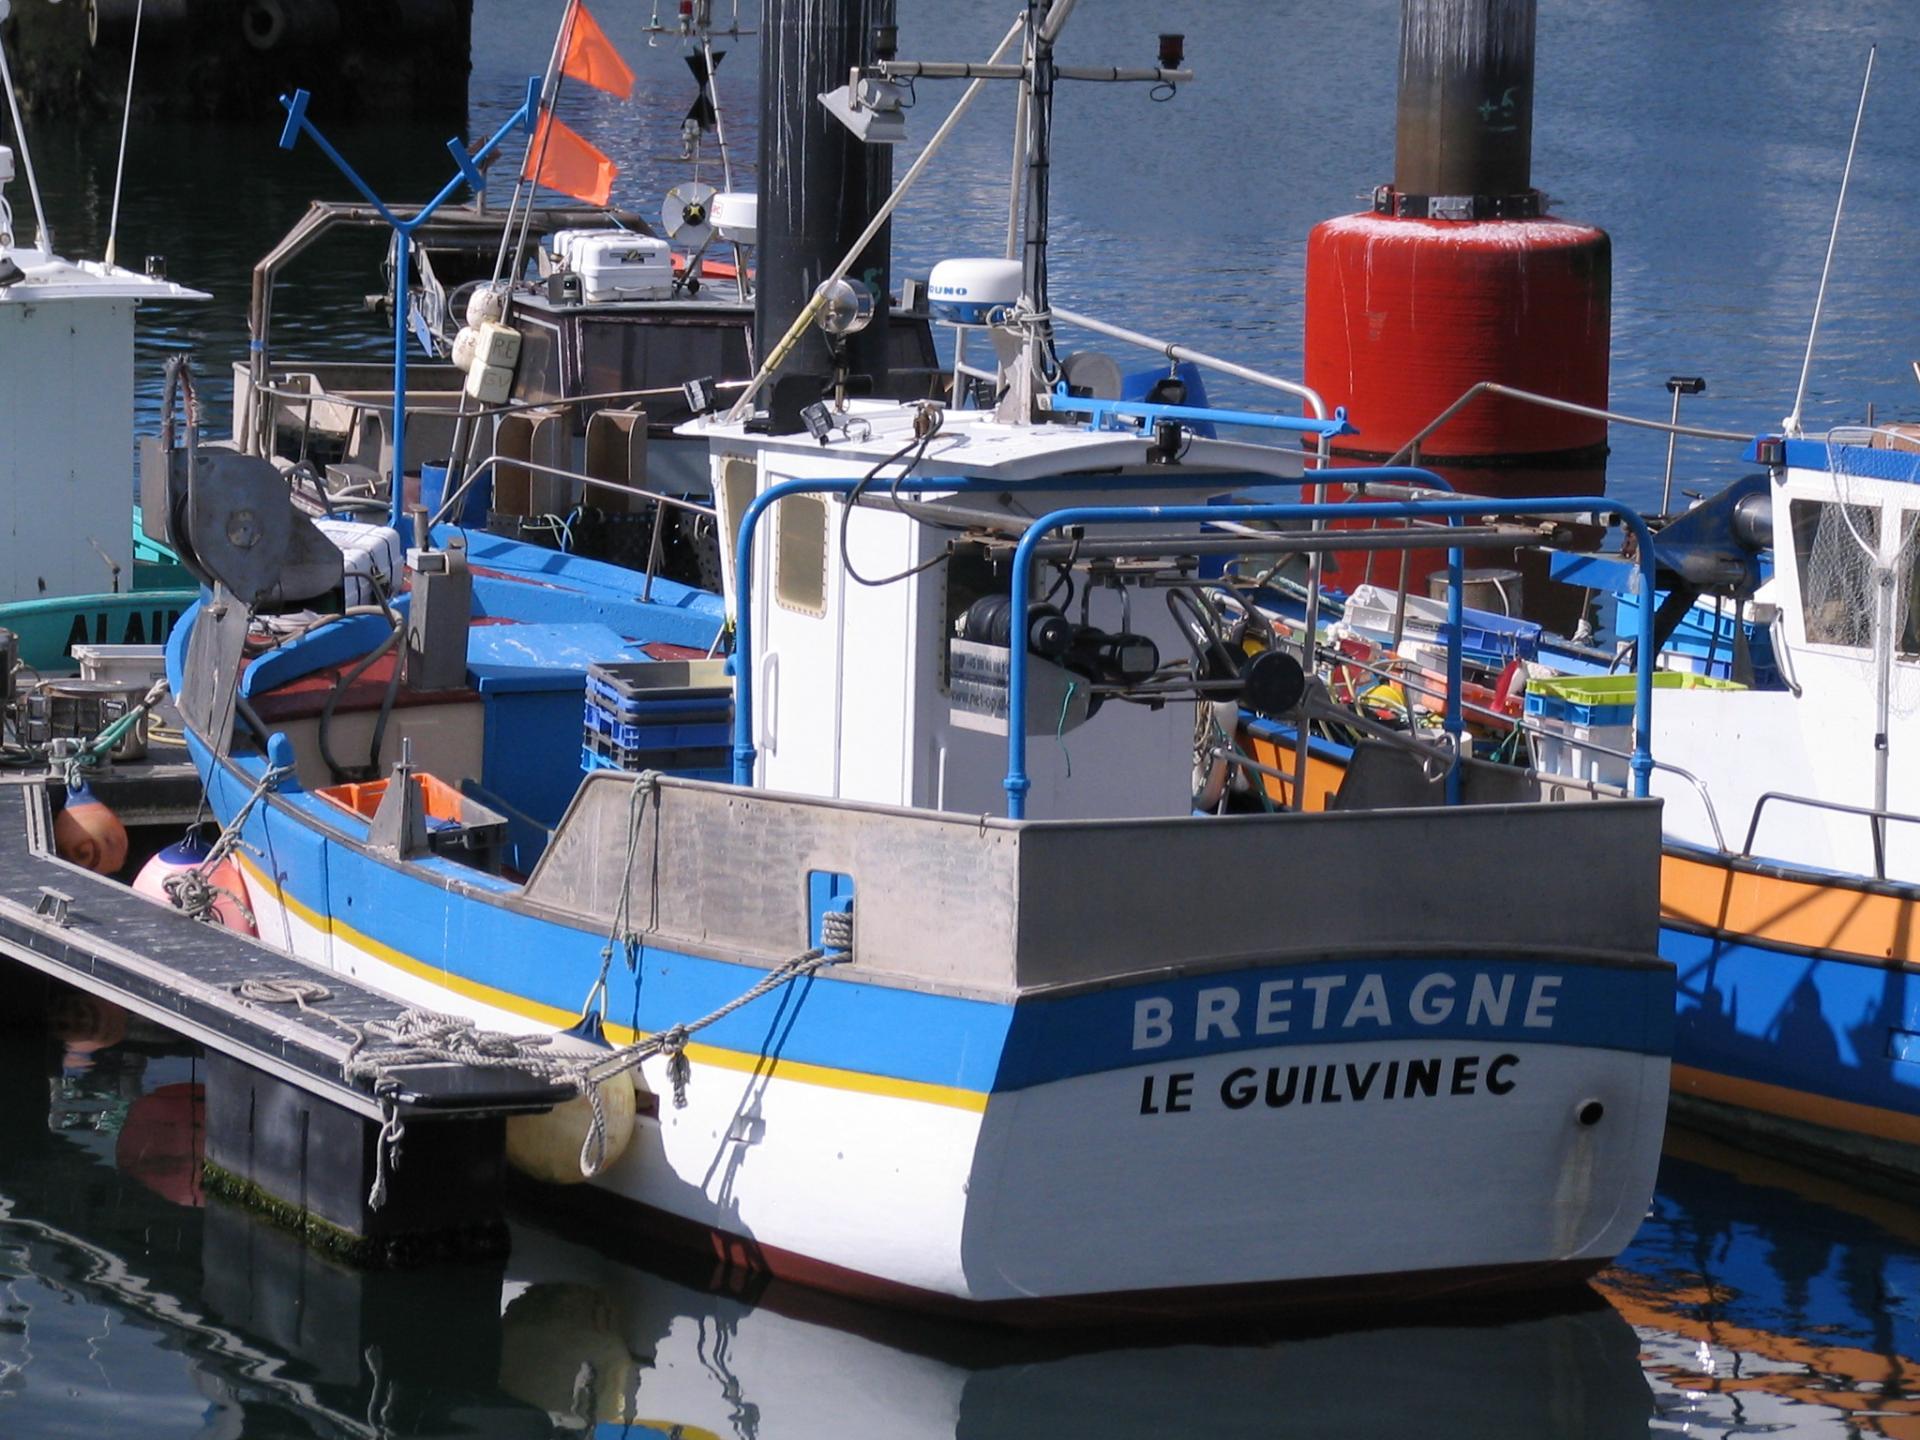 Bretagne gv270288 1